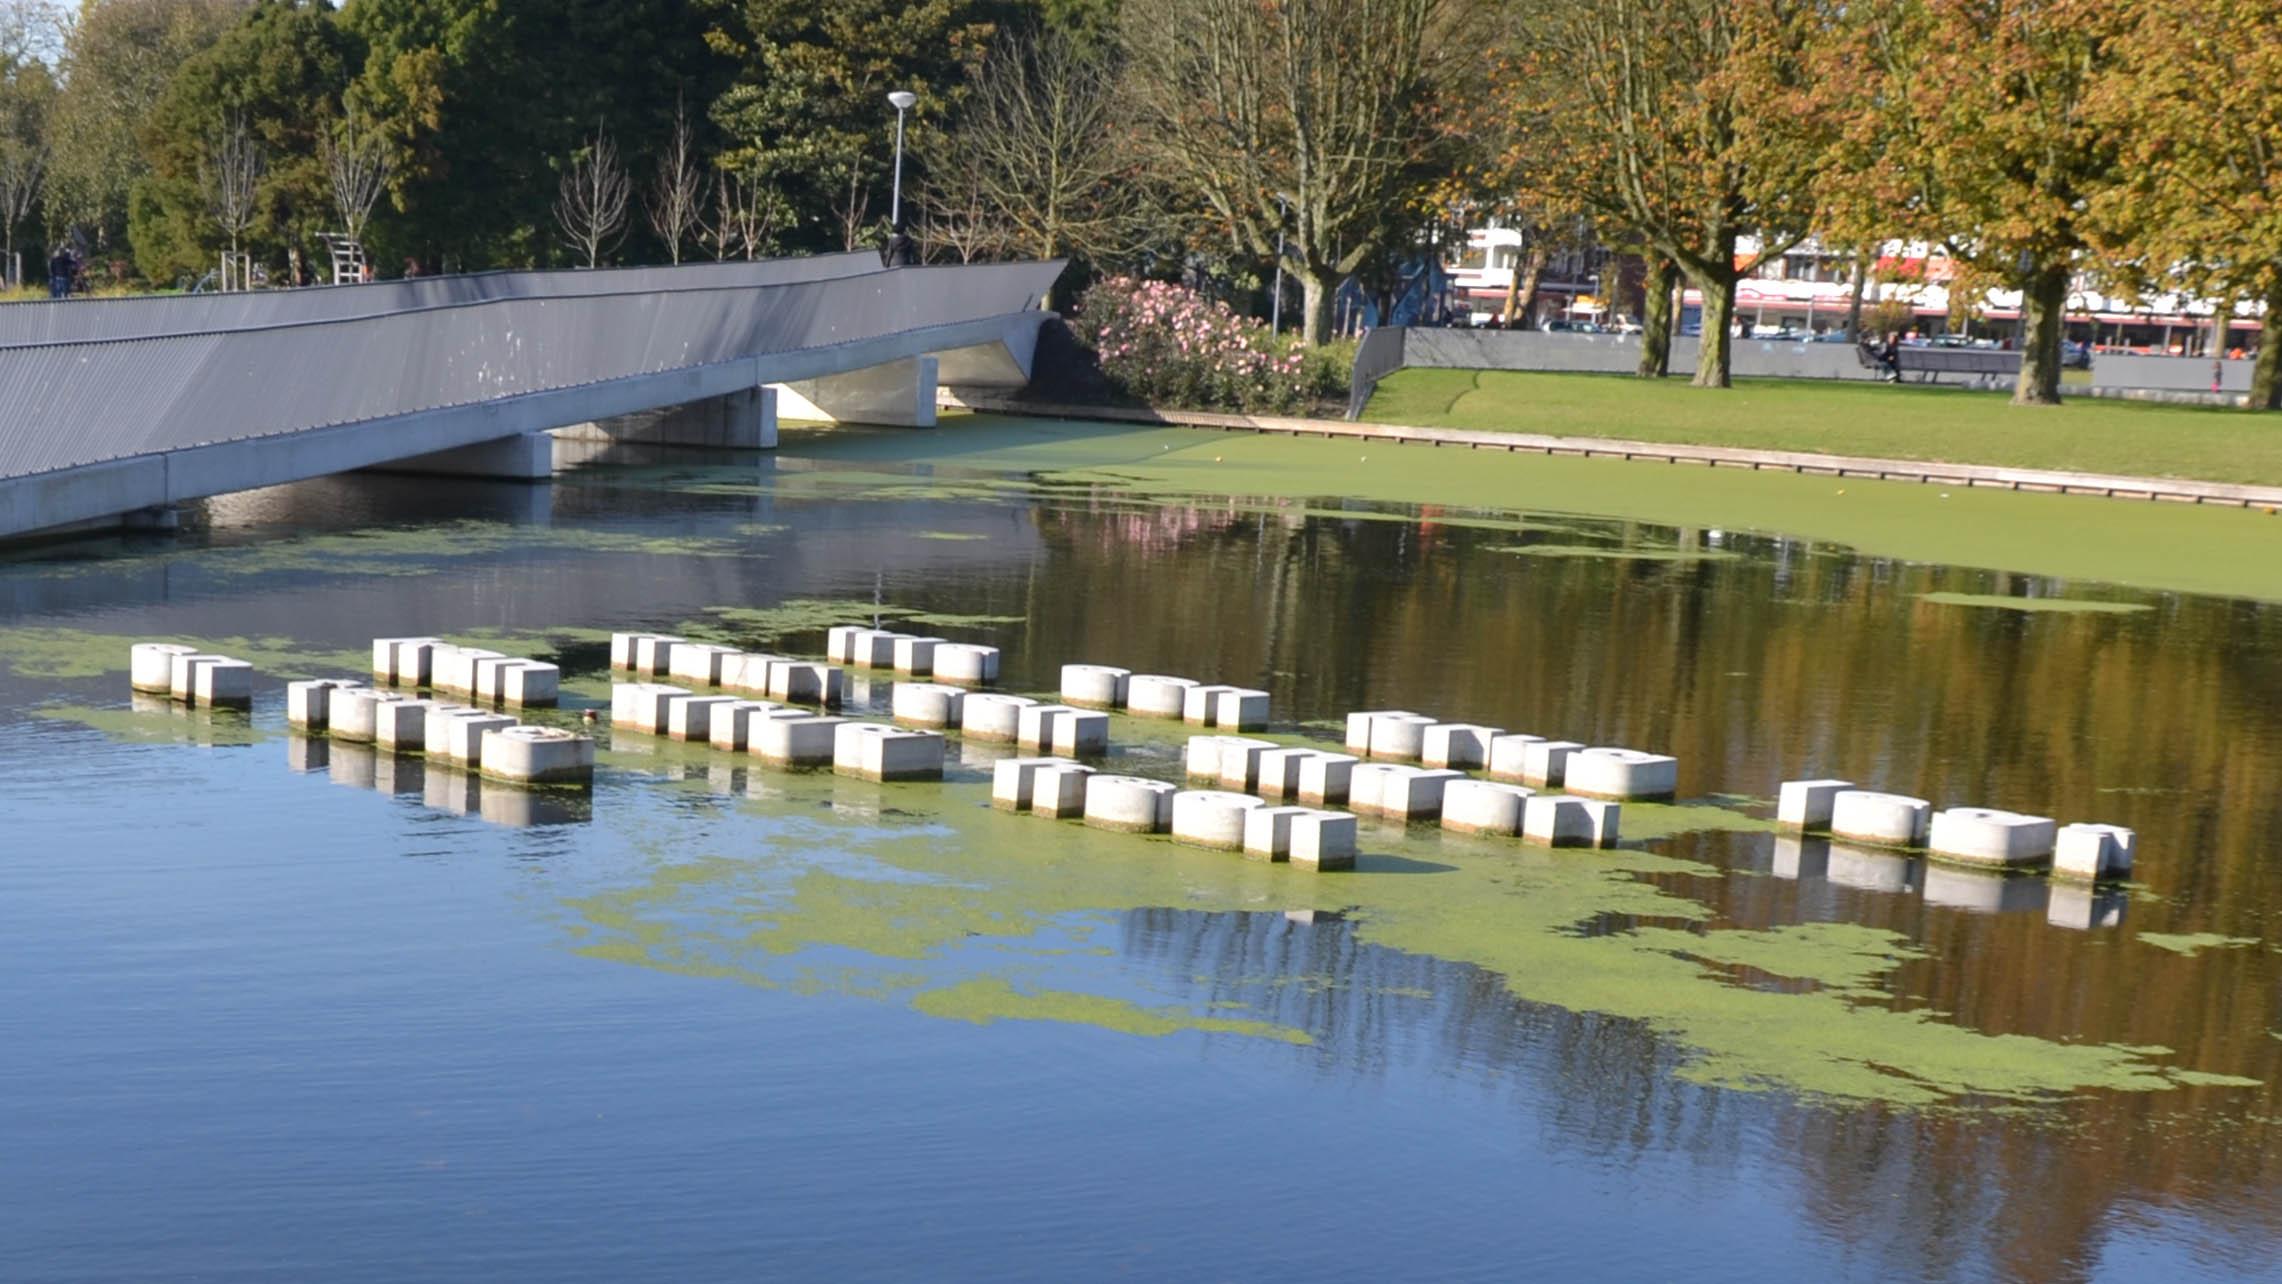 spinozapark rotterdam architect marja haring